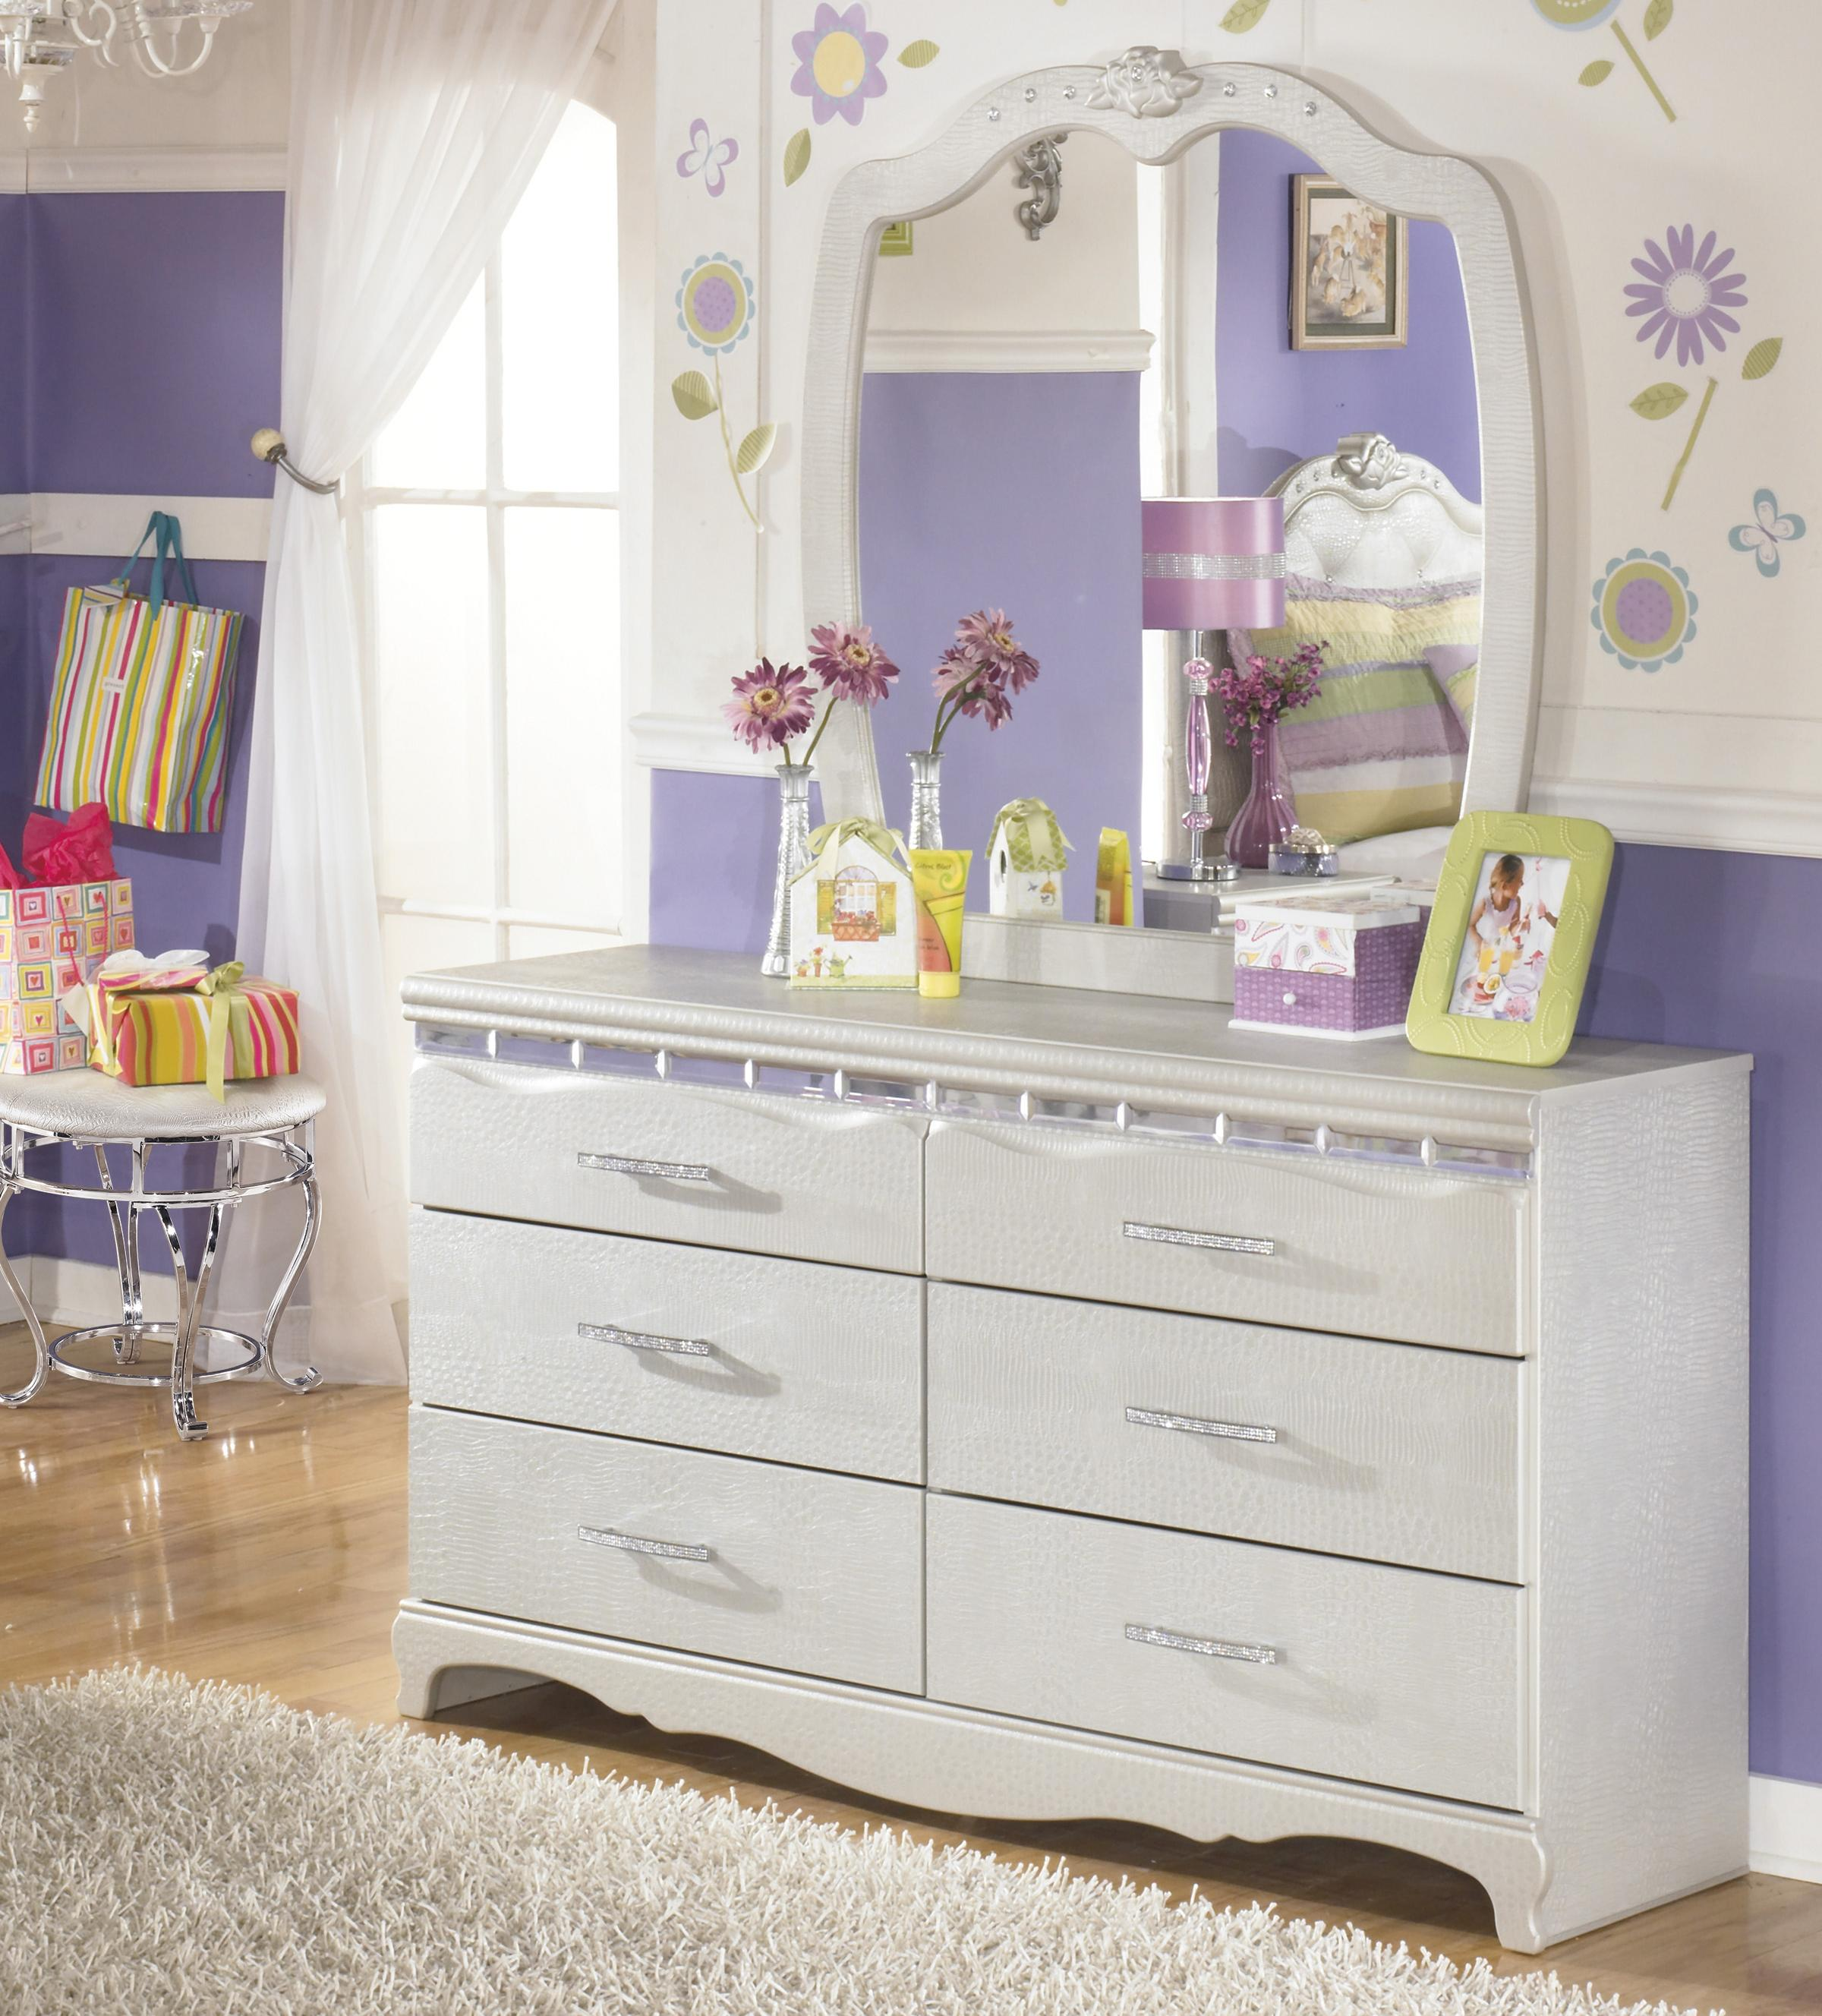 Signature Design by Ashley Zarollina Dresser & Bedroom Mirror - Item Number: B182-21+26